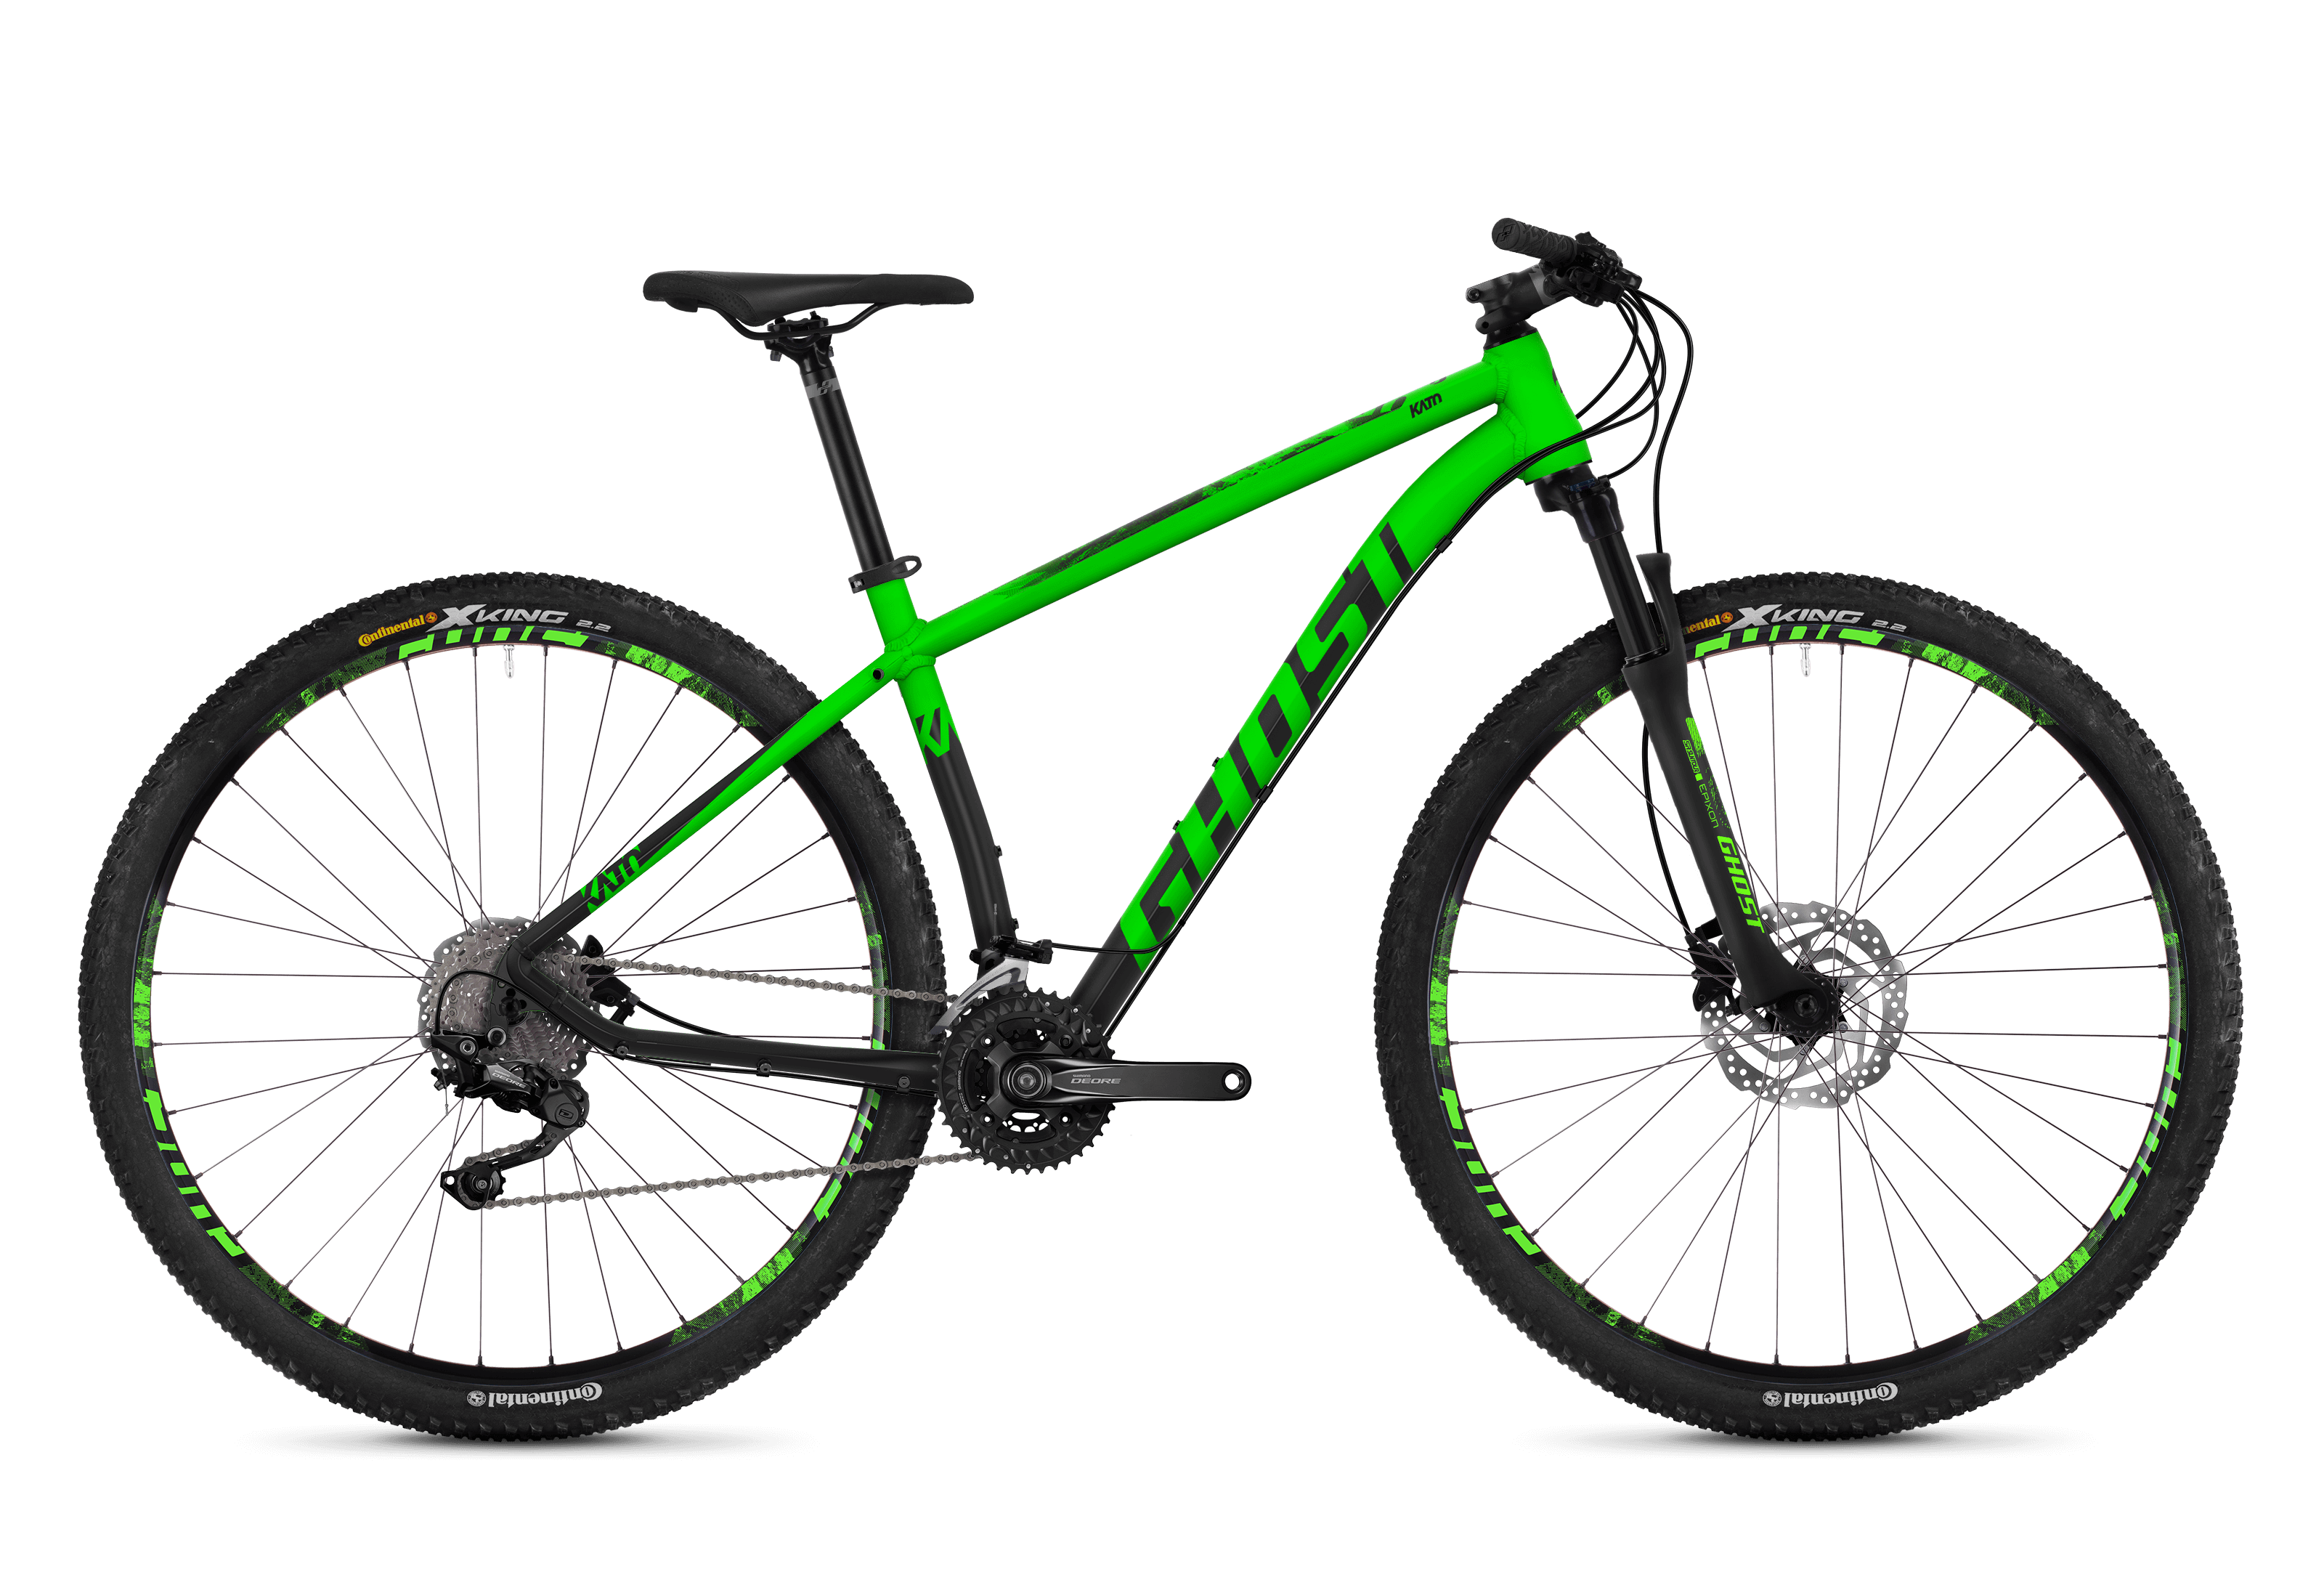 Horské kolo GHOST Kato 6.9 green / black S 2018